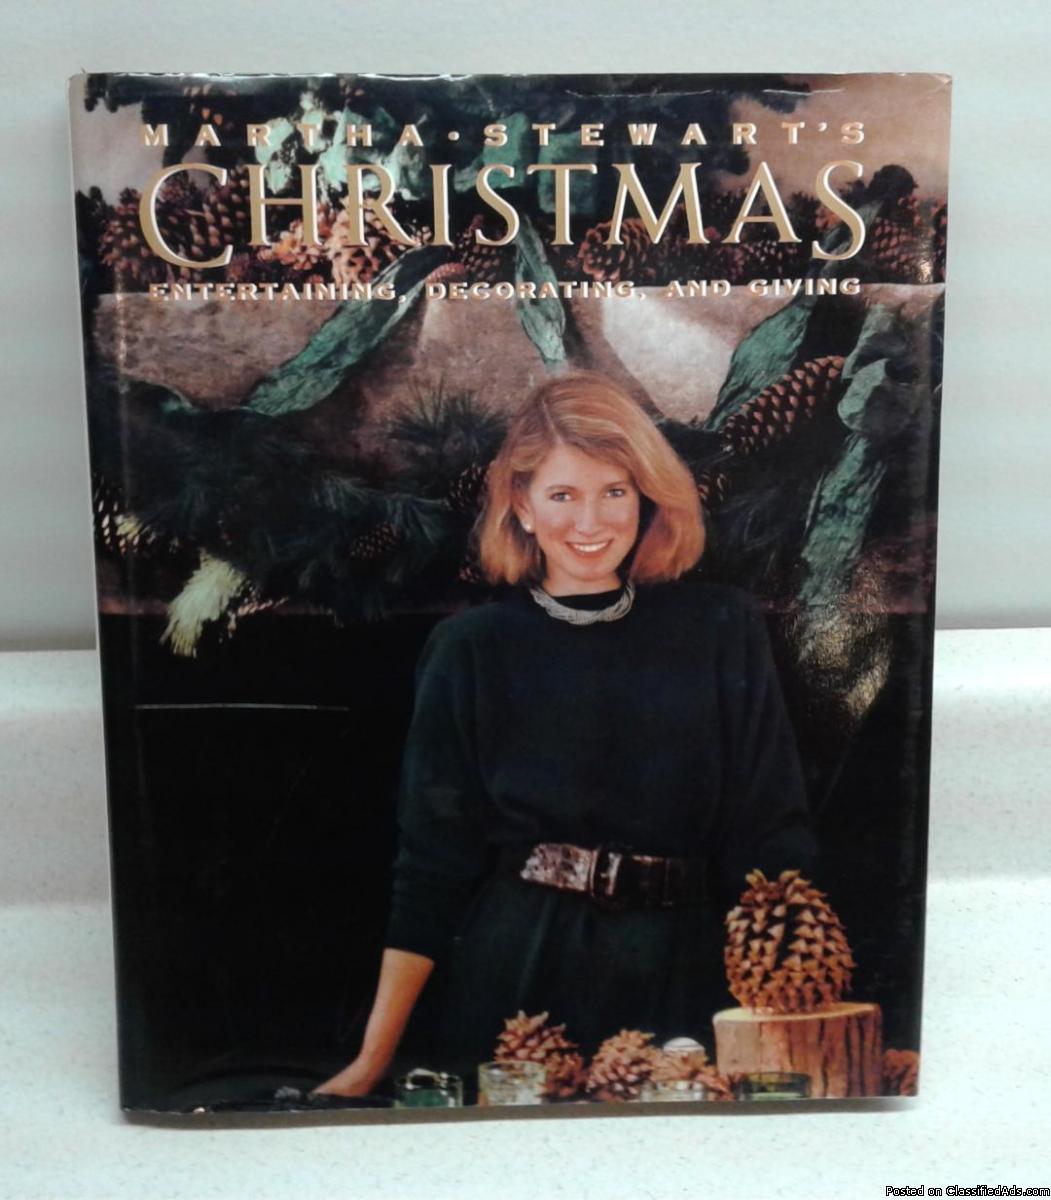 MARTHA STEWART'S CHRISTMAS ENTERTAINING, DECORATING & GIVING